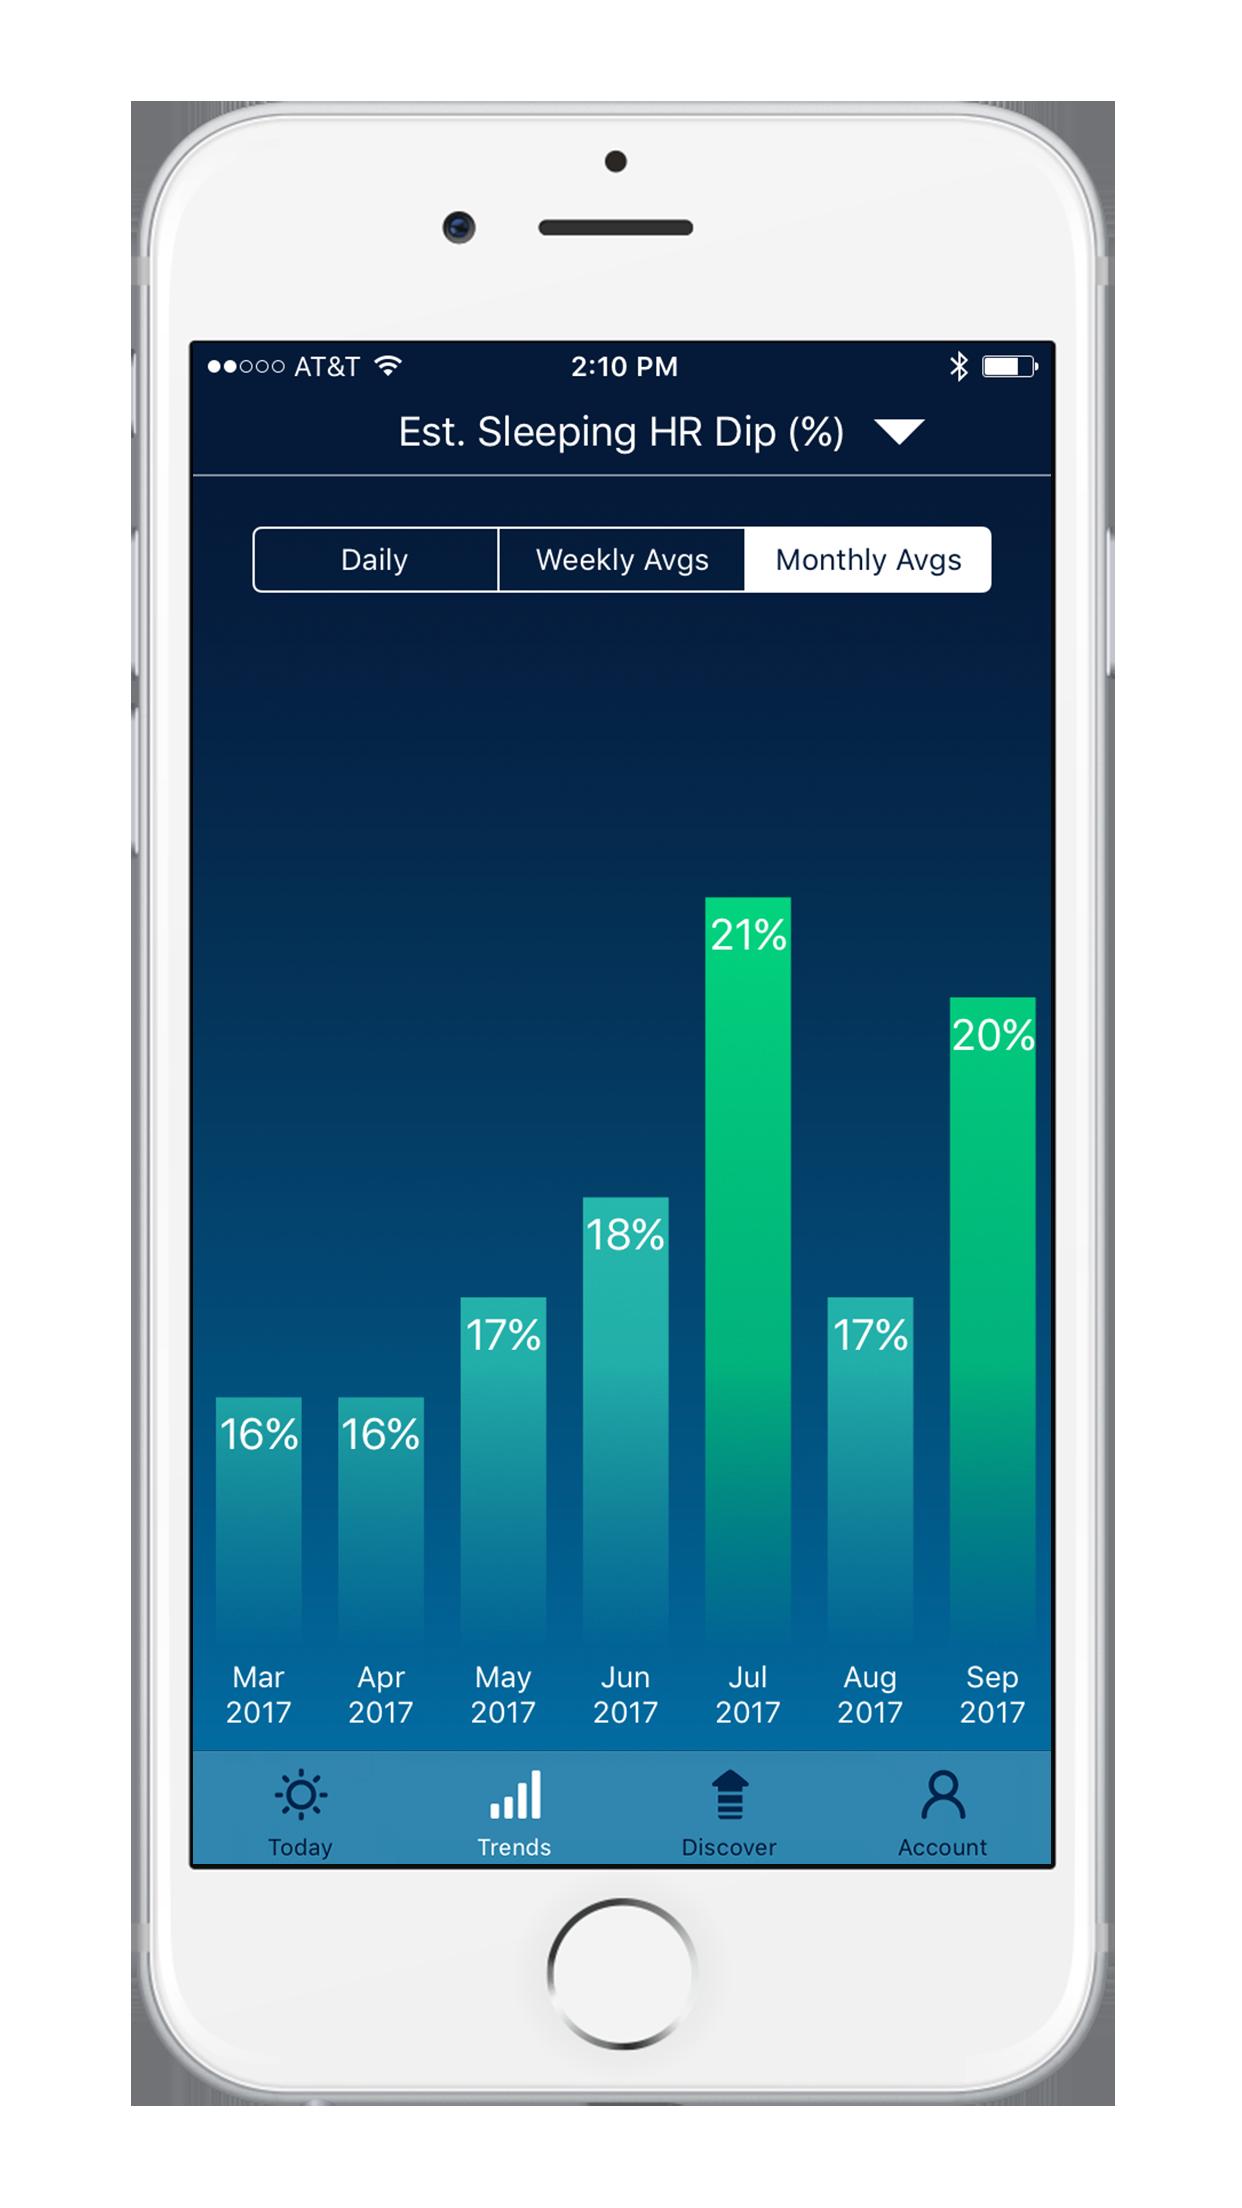 Sleep Watch Version 3 by Bodymatter on iPhone Trends Sleeping Heart Rate Dip